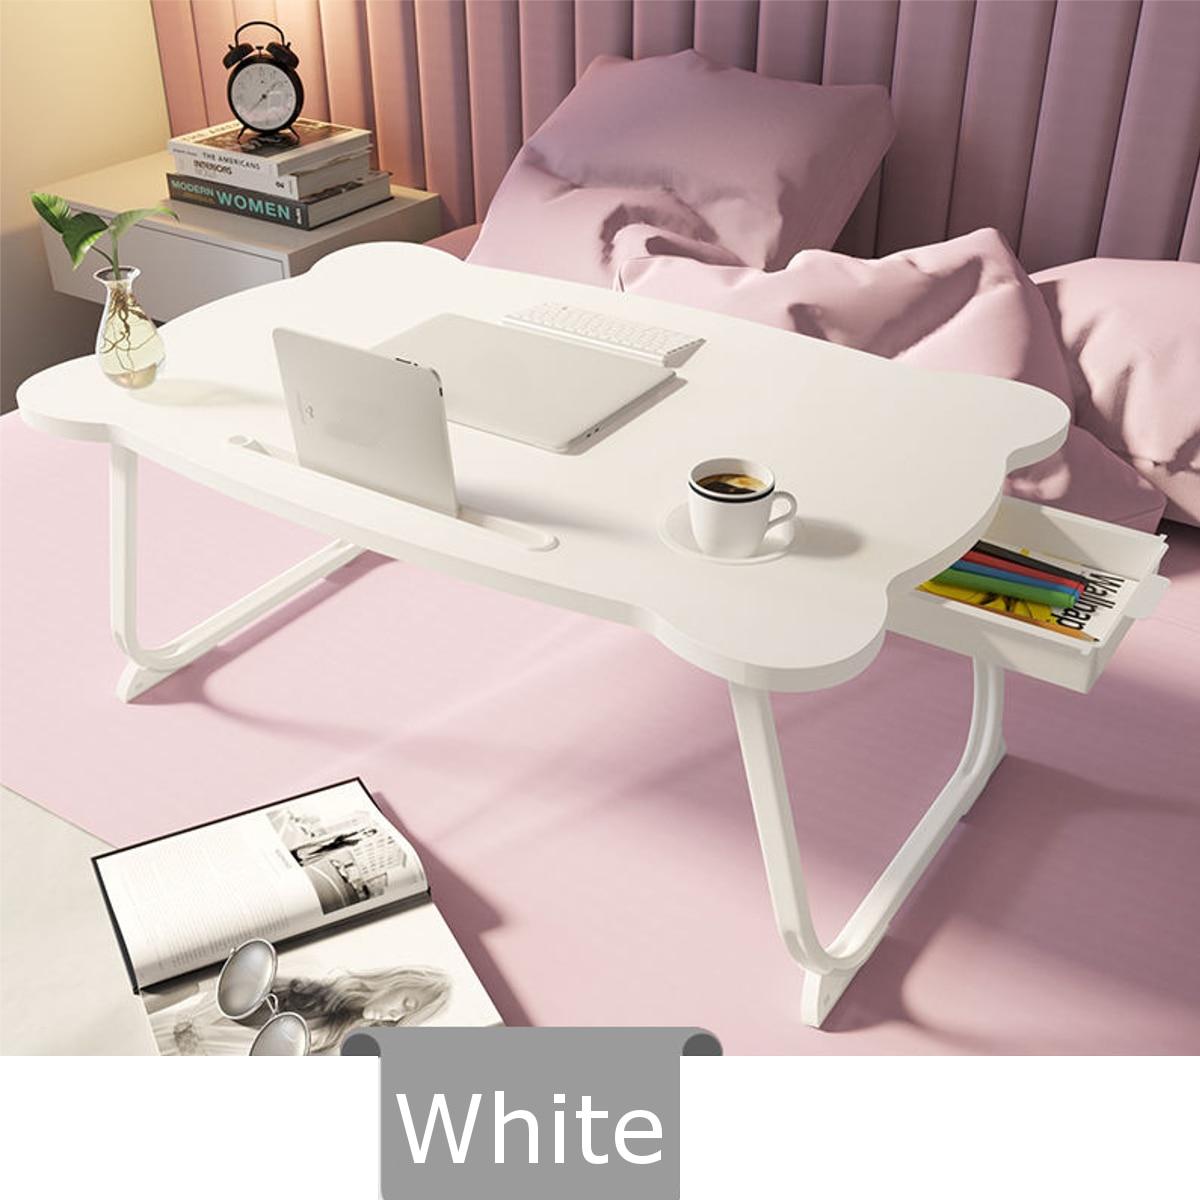 CN Multi-functional Folding Laptop Stand Holder Study Table Desk Wooden Foldable Computer Desk for Bed Sofa Tea Serving Table